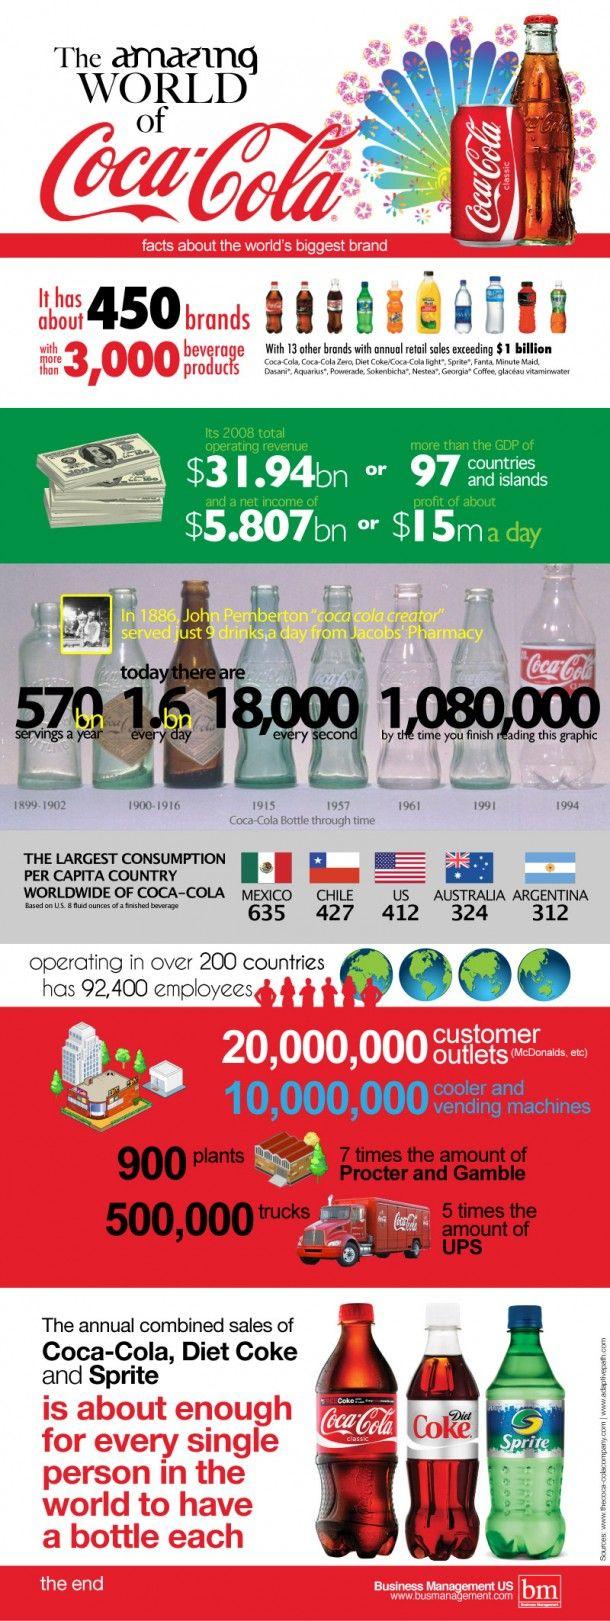 The Amazing World Of Coca-Cola[INFOGRAPHIC]